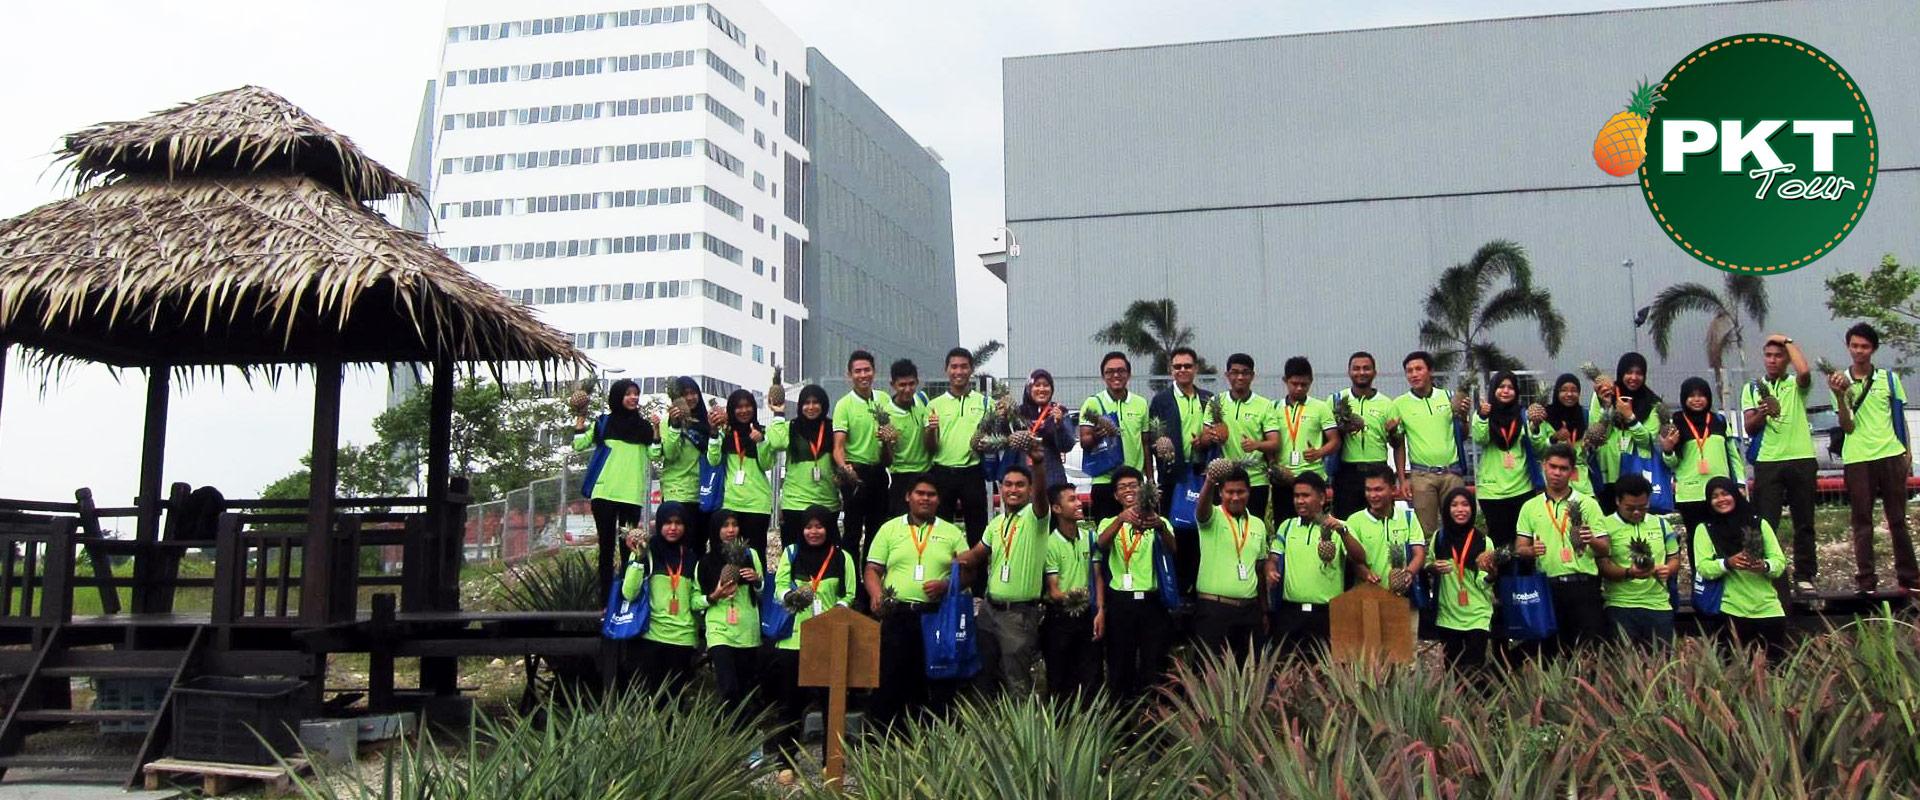 PKT Logistics Group Sdn Bhd – An Awards Winning Logistics Company